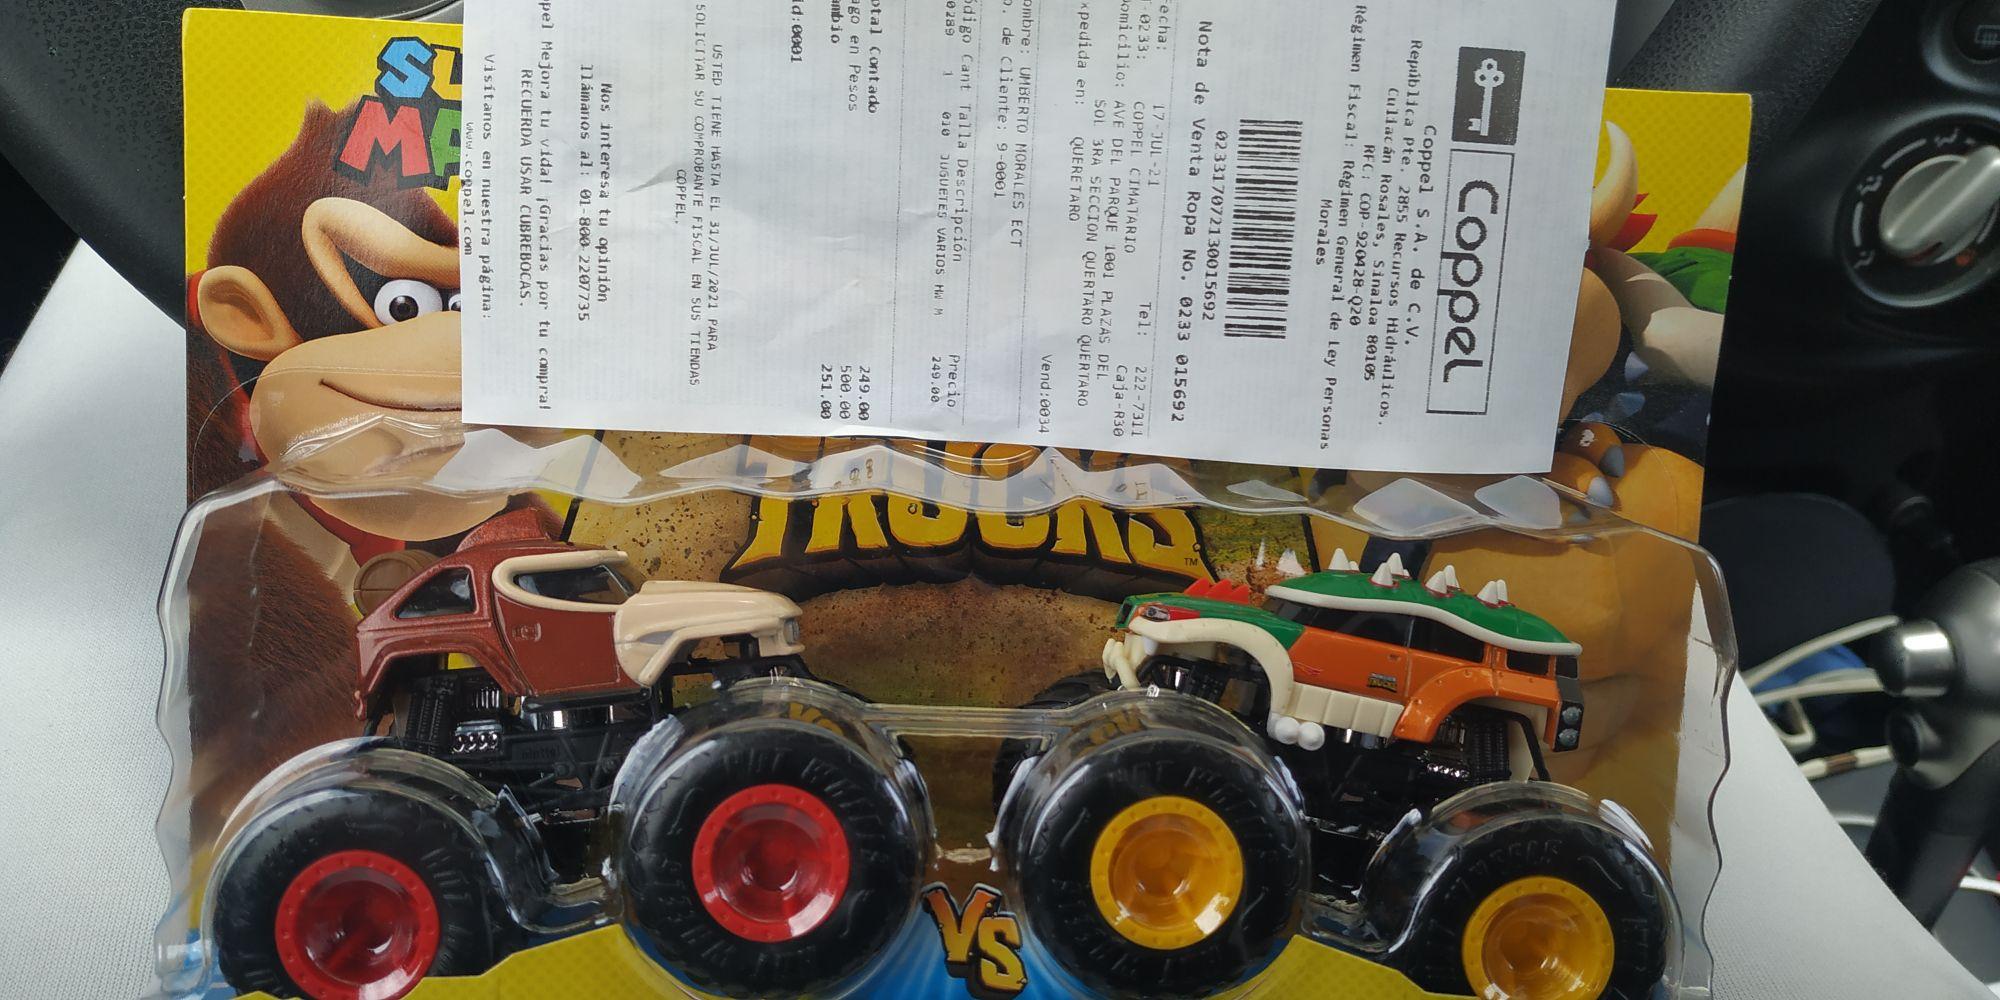 Coppel: Hotwheels Monster Truck Donkey Kong vs Bowser